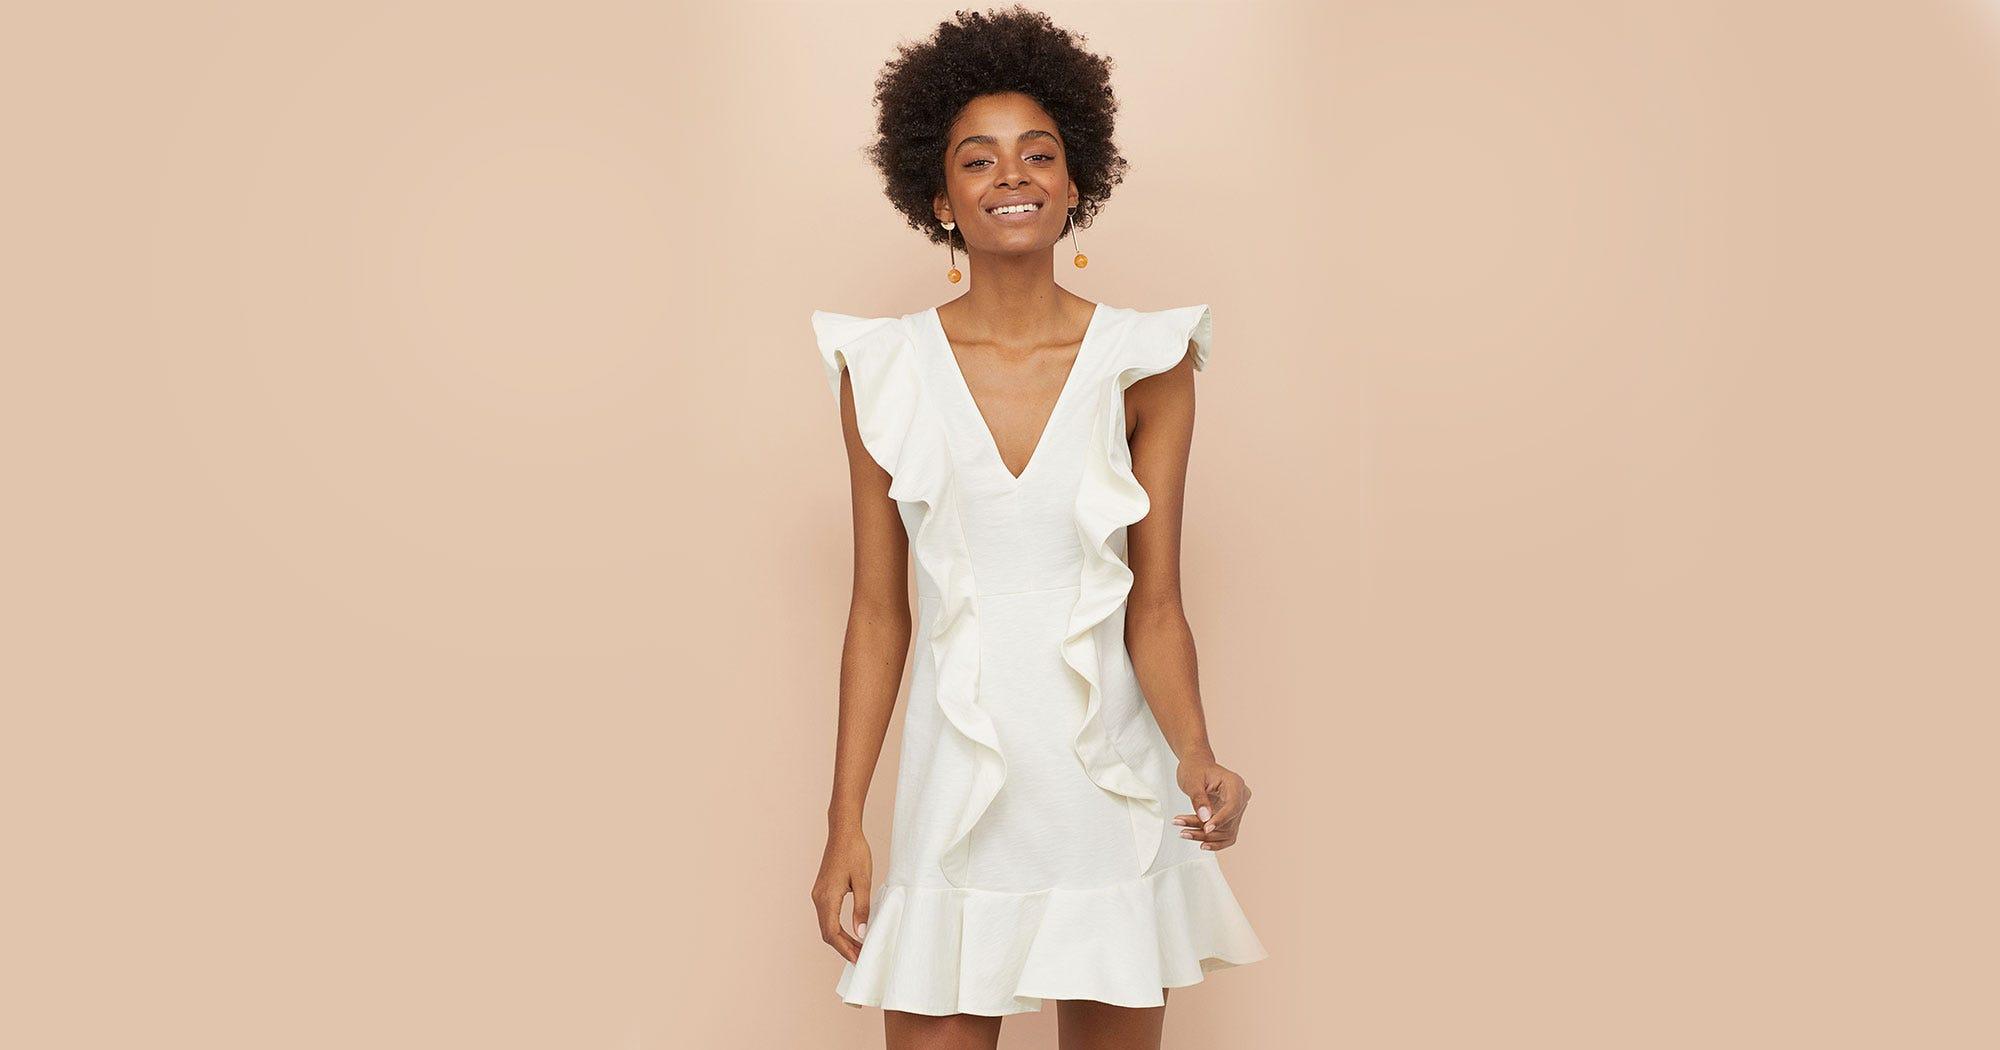 Short Wedding Dresses 2019 Traditional & Elegant Styles